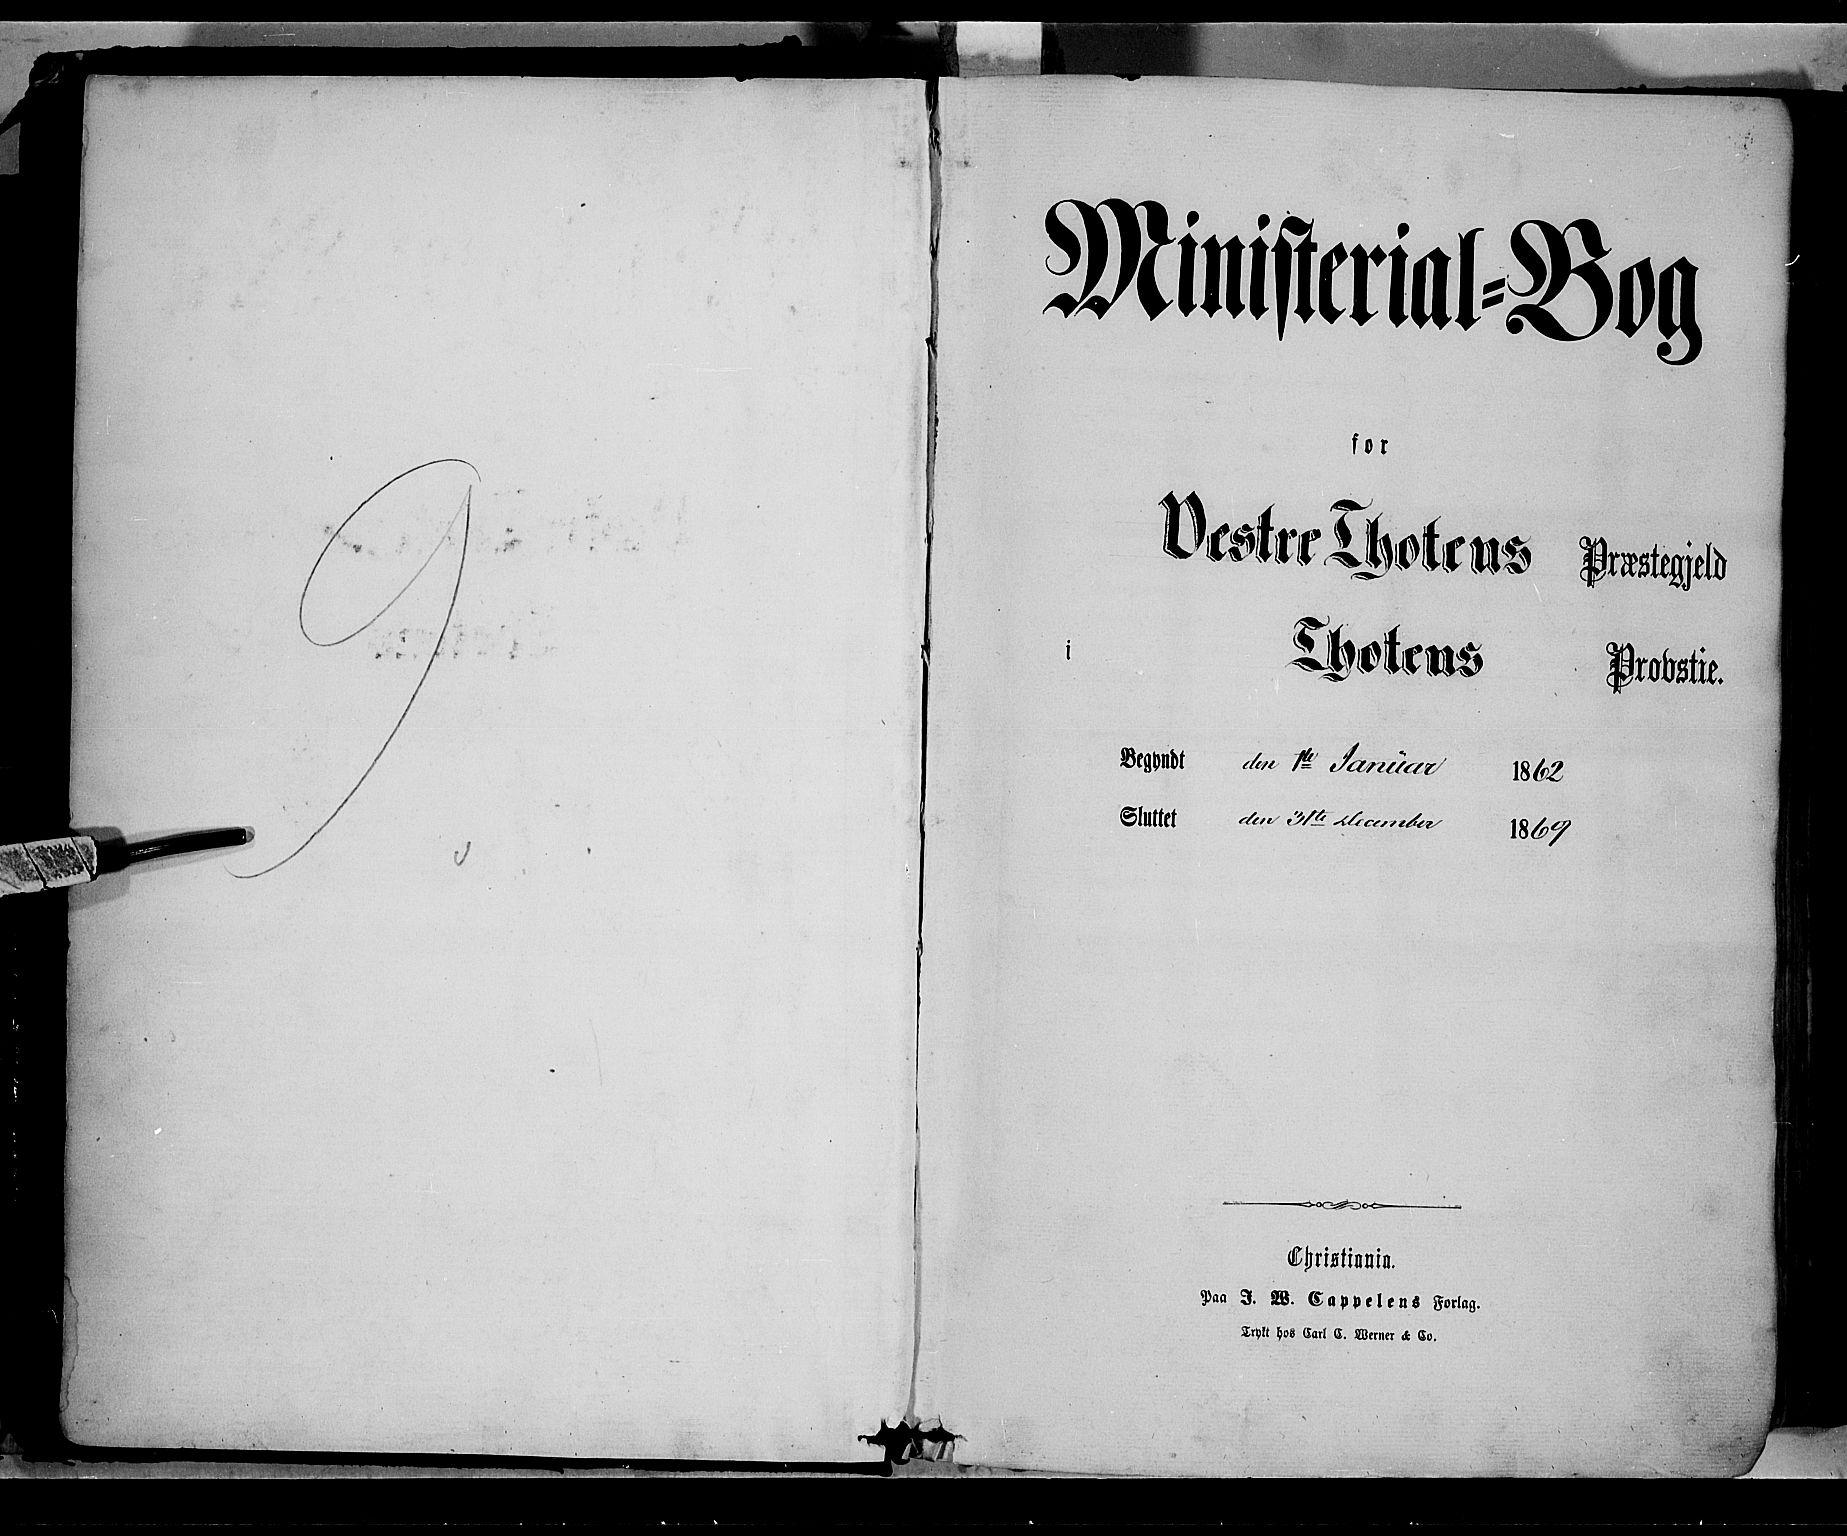 SAH, Vestre Toten prestekontor, H/Ha/Haa/L0007: Ministerialbok nr. 7, 1862-1869